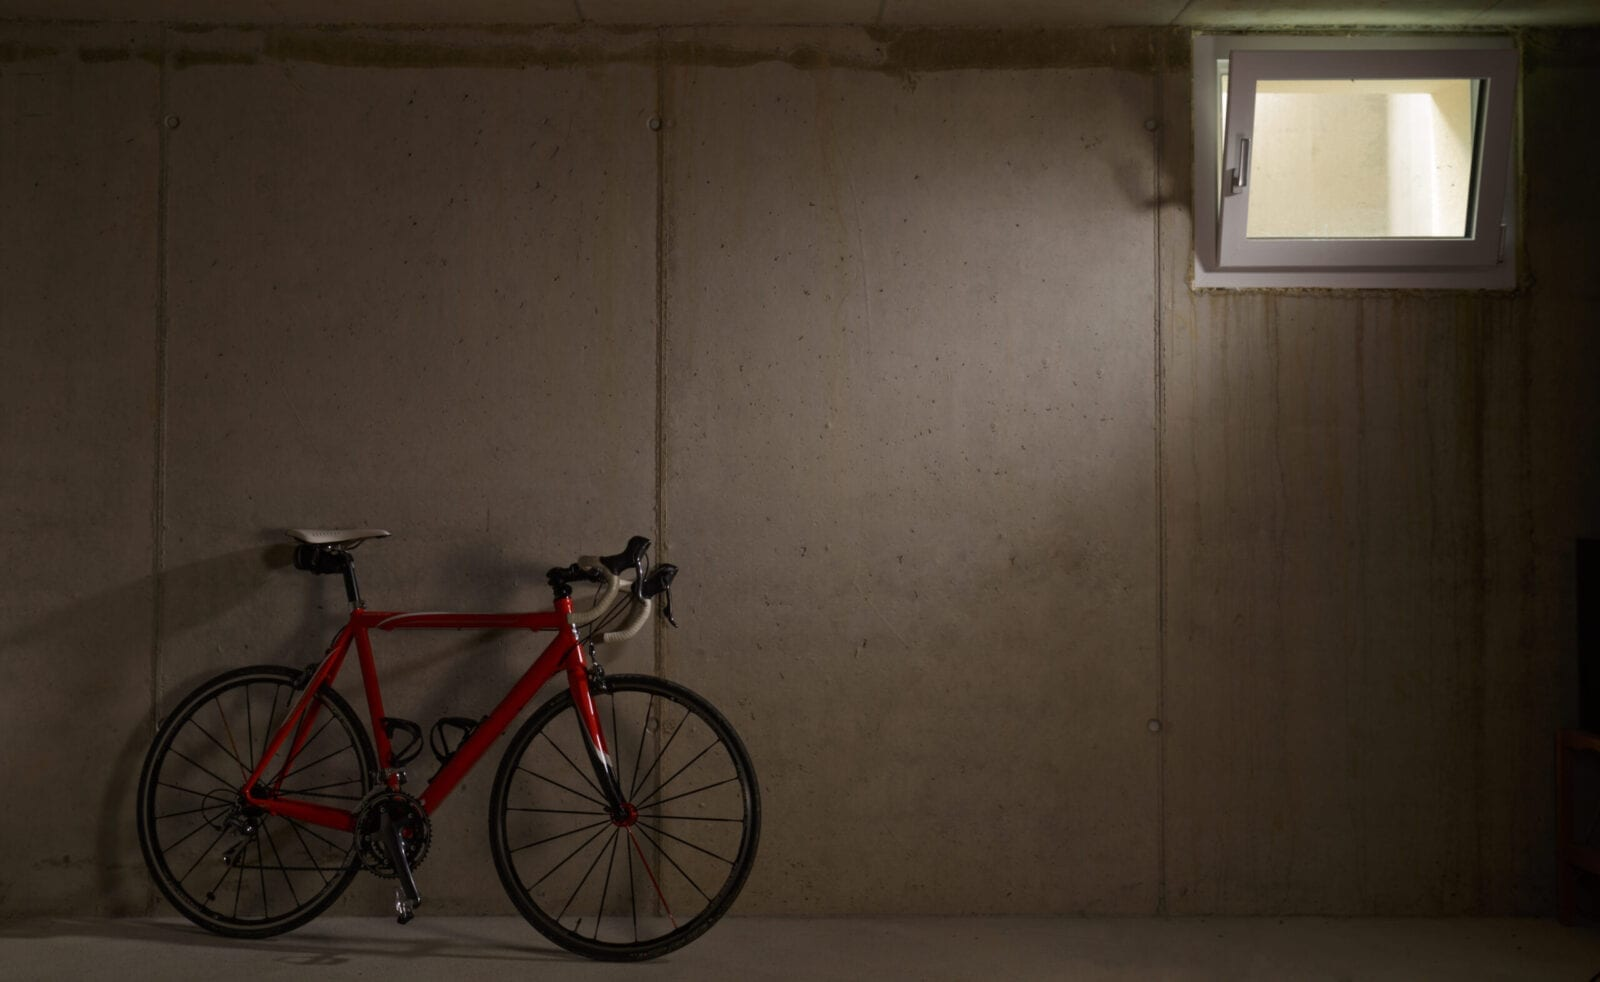 Fahrrad das im Keller steht